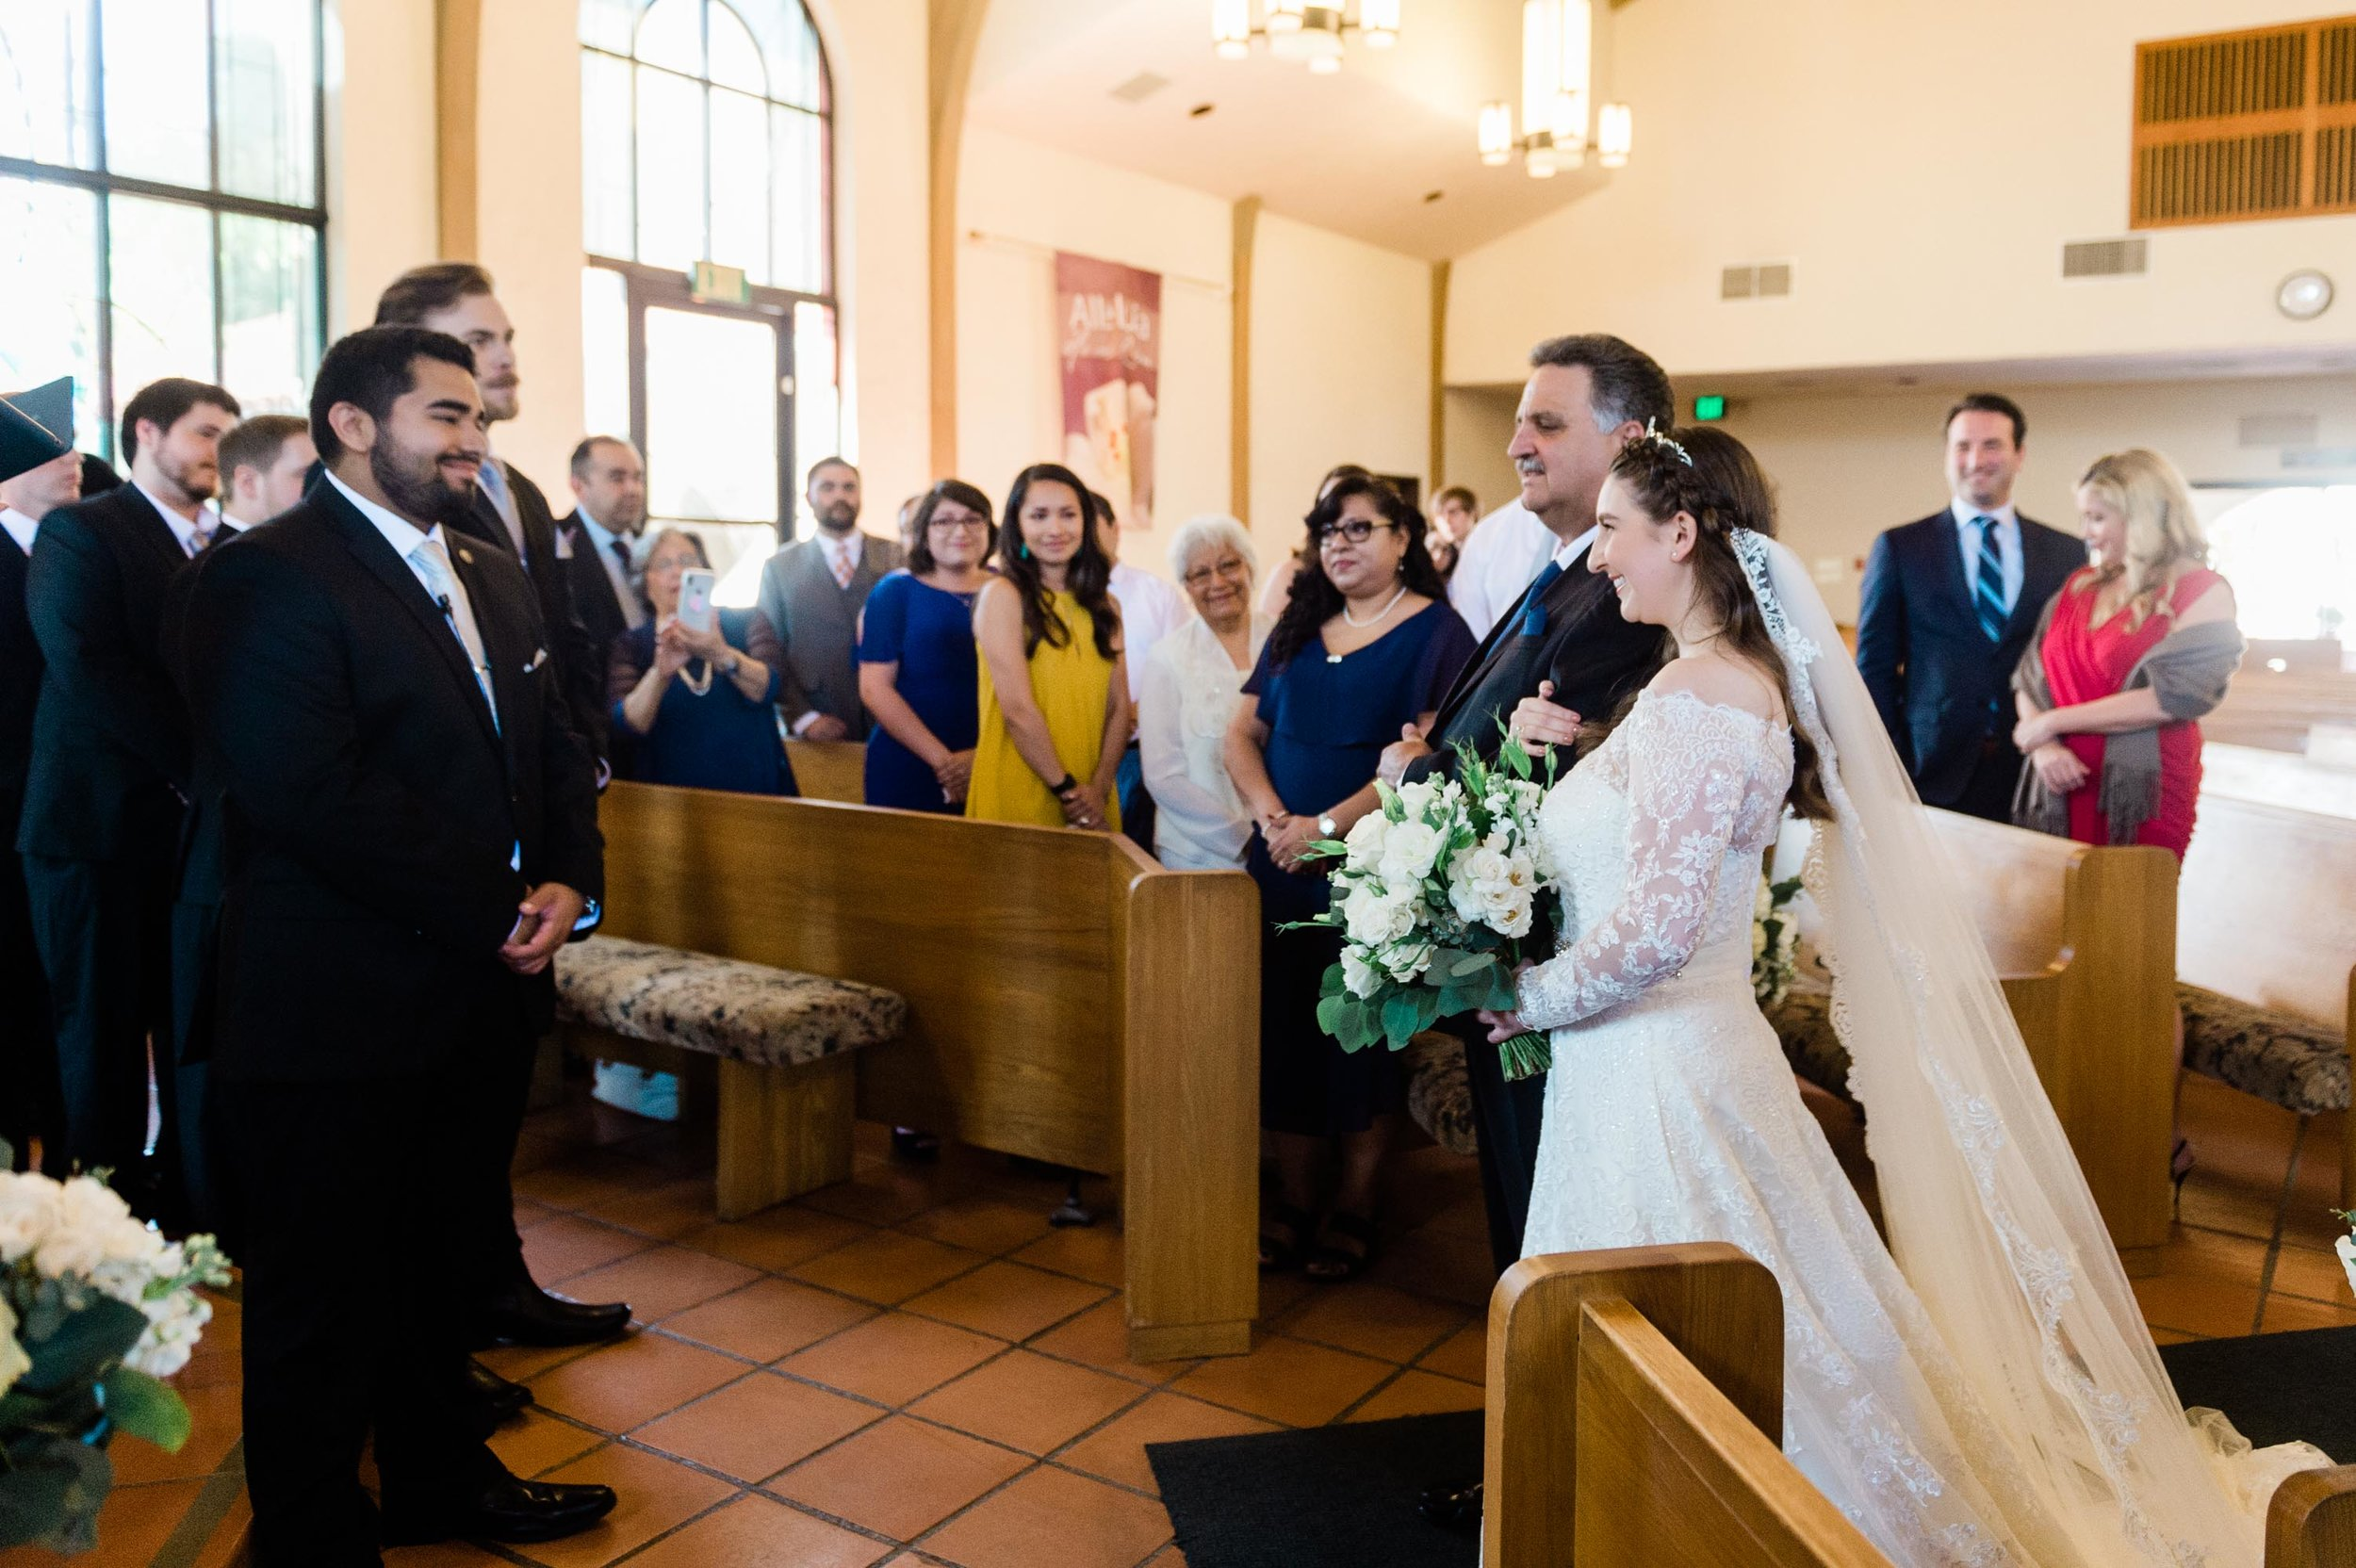 Westminster Presbyterian Church, Westlake Village, Ca Wedding Photographer | Jennifer Lourie